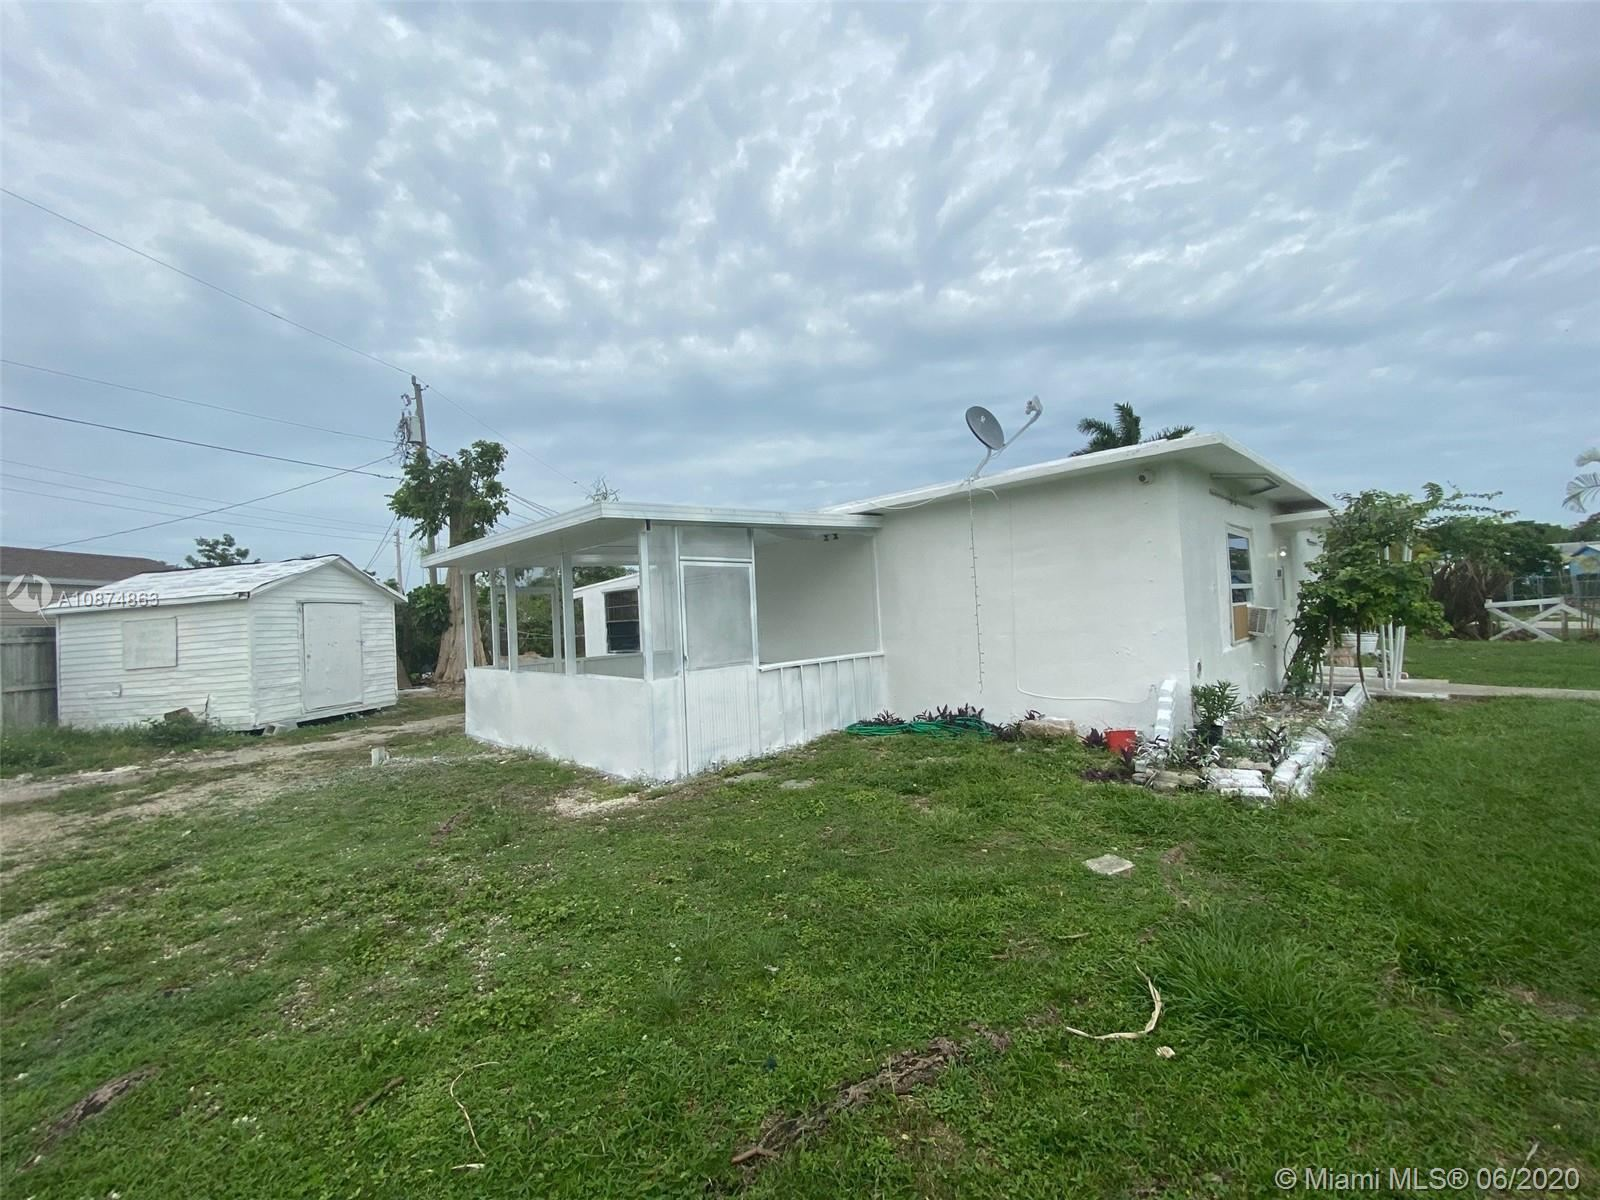 14795 Coolidge Ln, Homestead, FL 33033 - #: A10874863